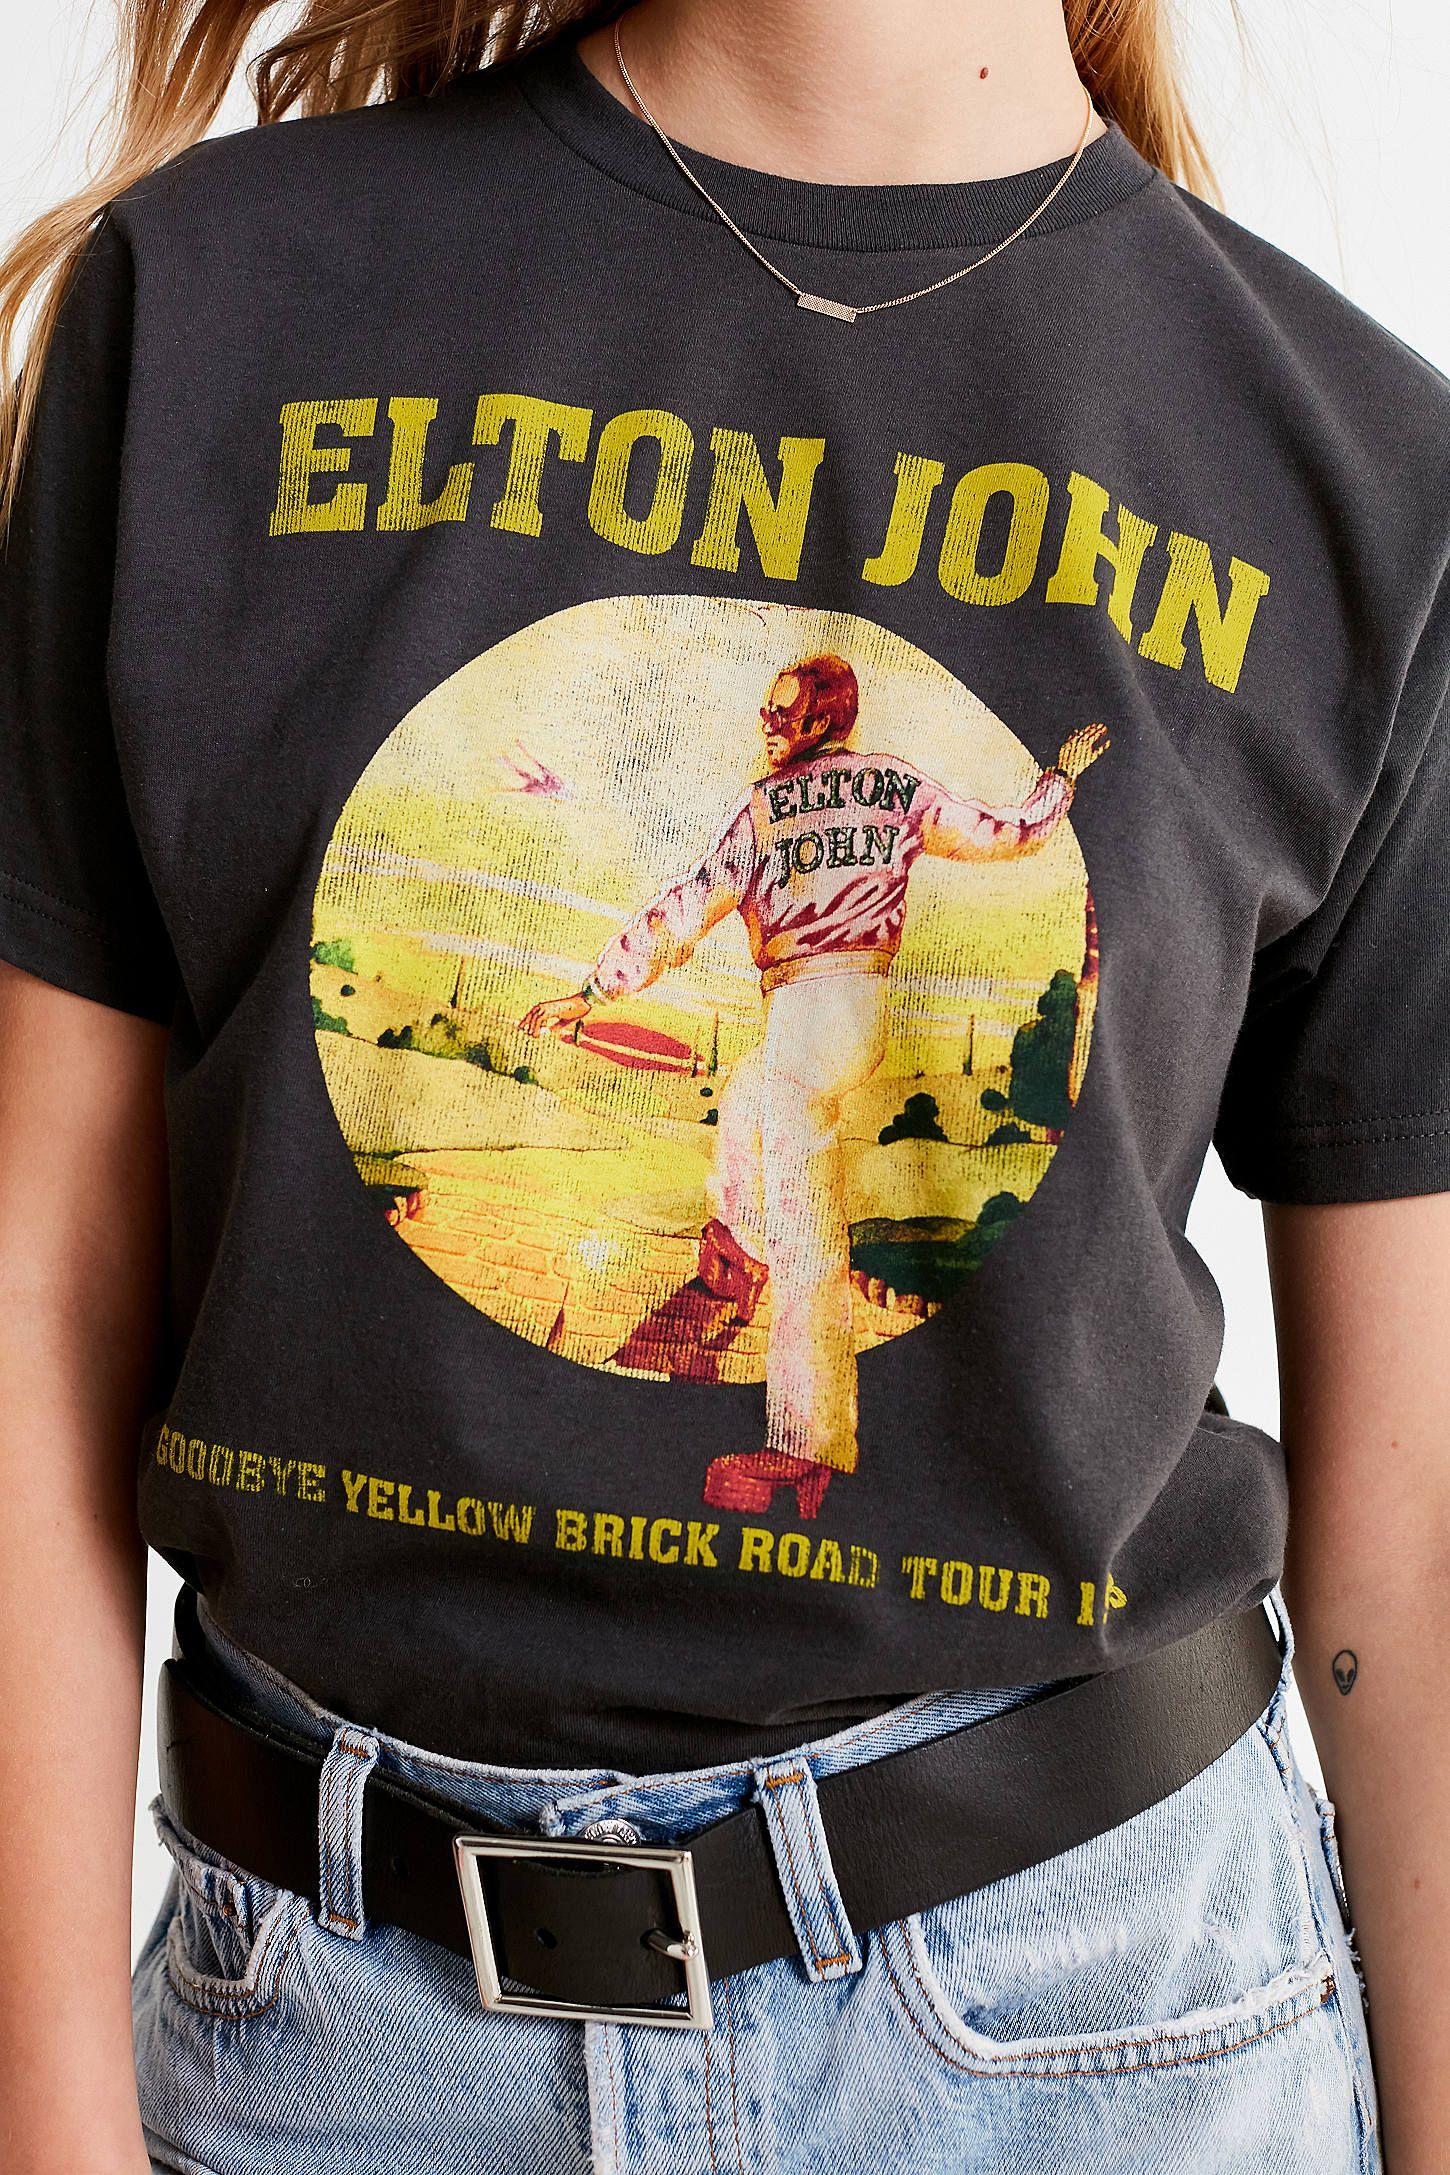 Elton John Farewell Tour Shirt Womens Crew Neck Shirt Elton John Shirt